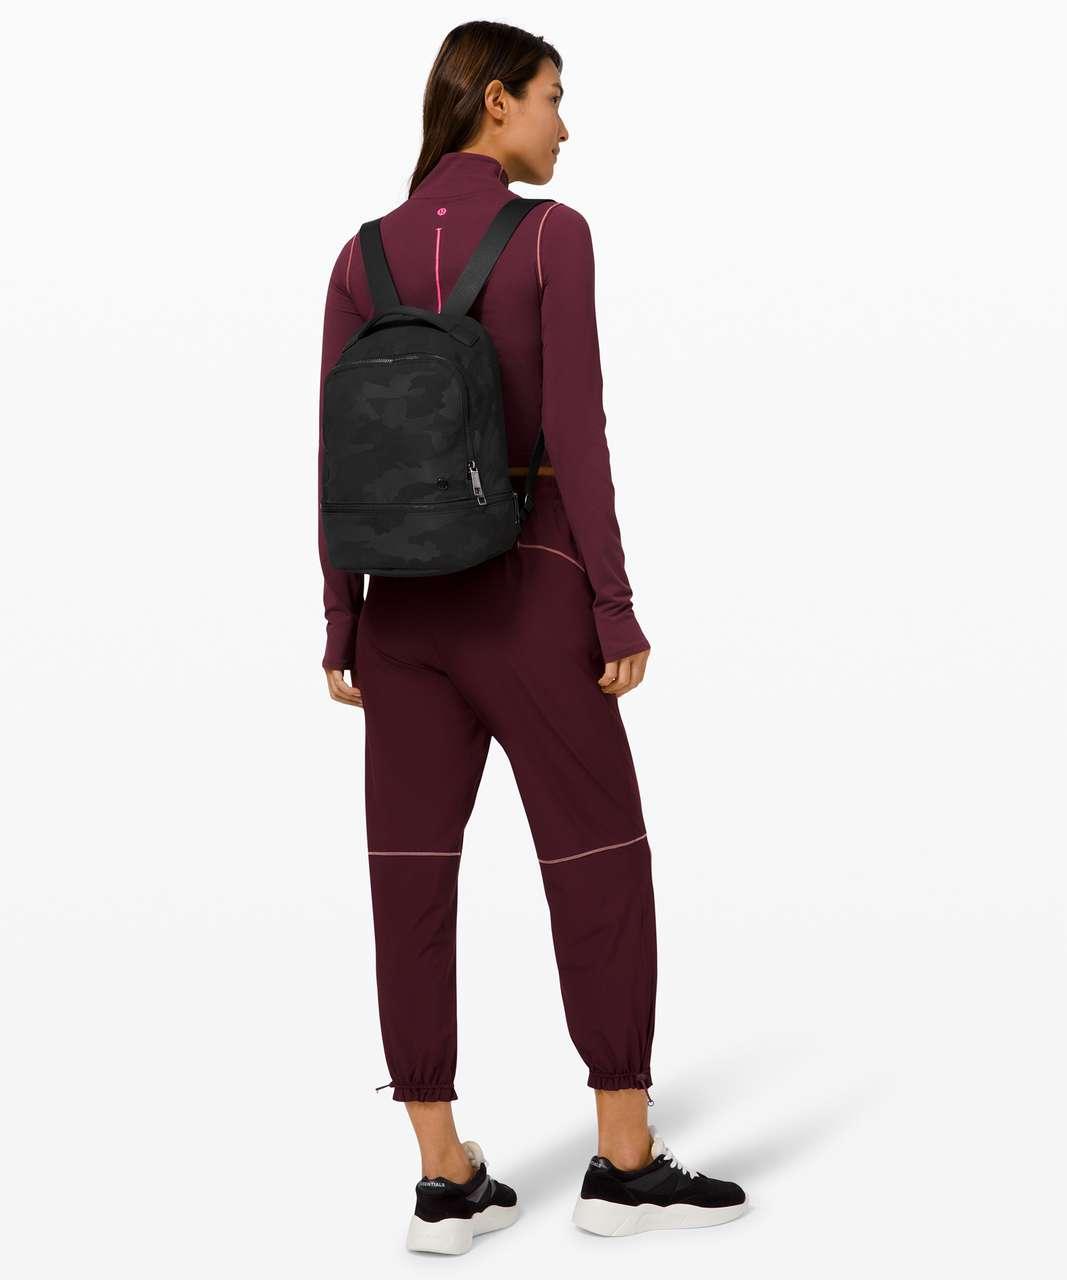 Lululemon City Adventurer Backpack Mini *10L - Heritage Camo Jacquard Max Black Graphite Grey